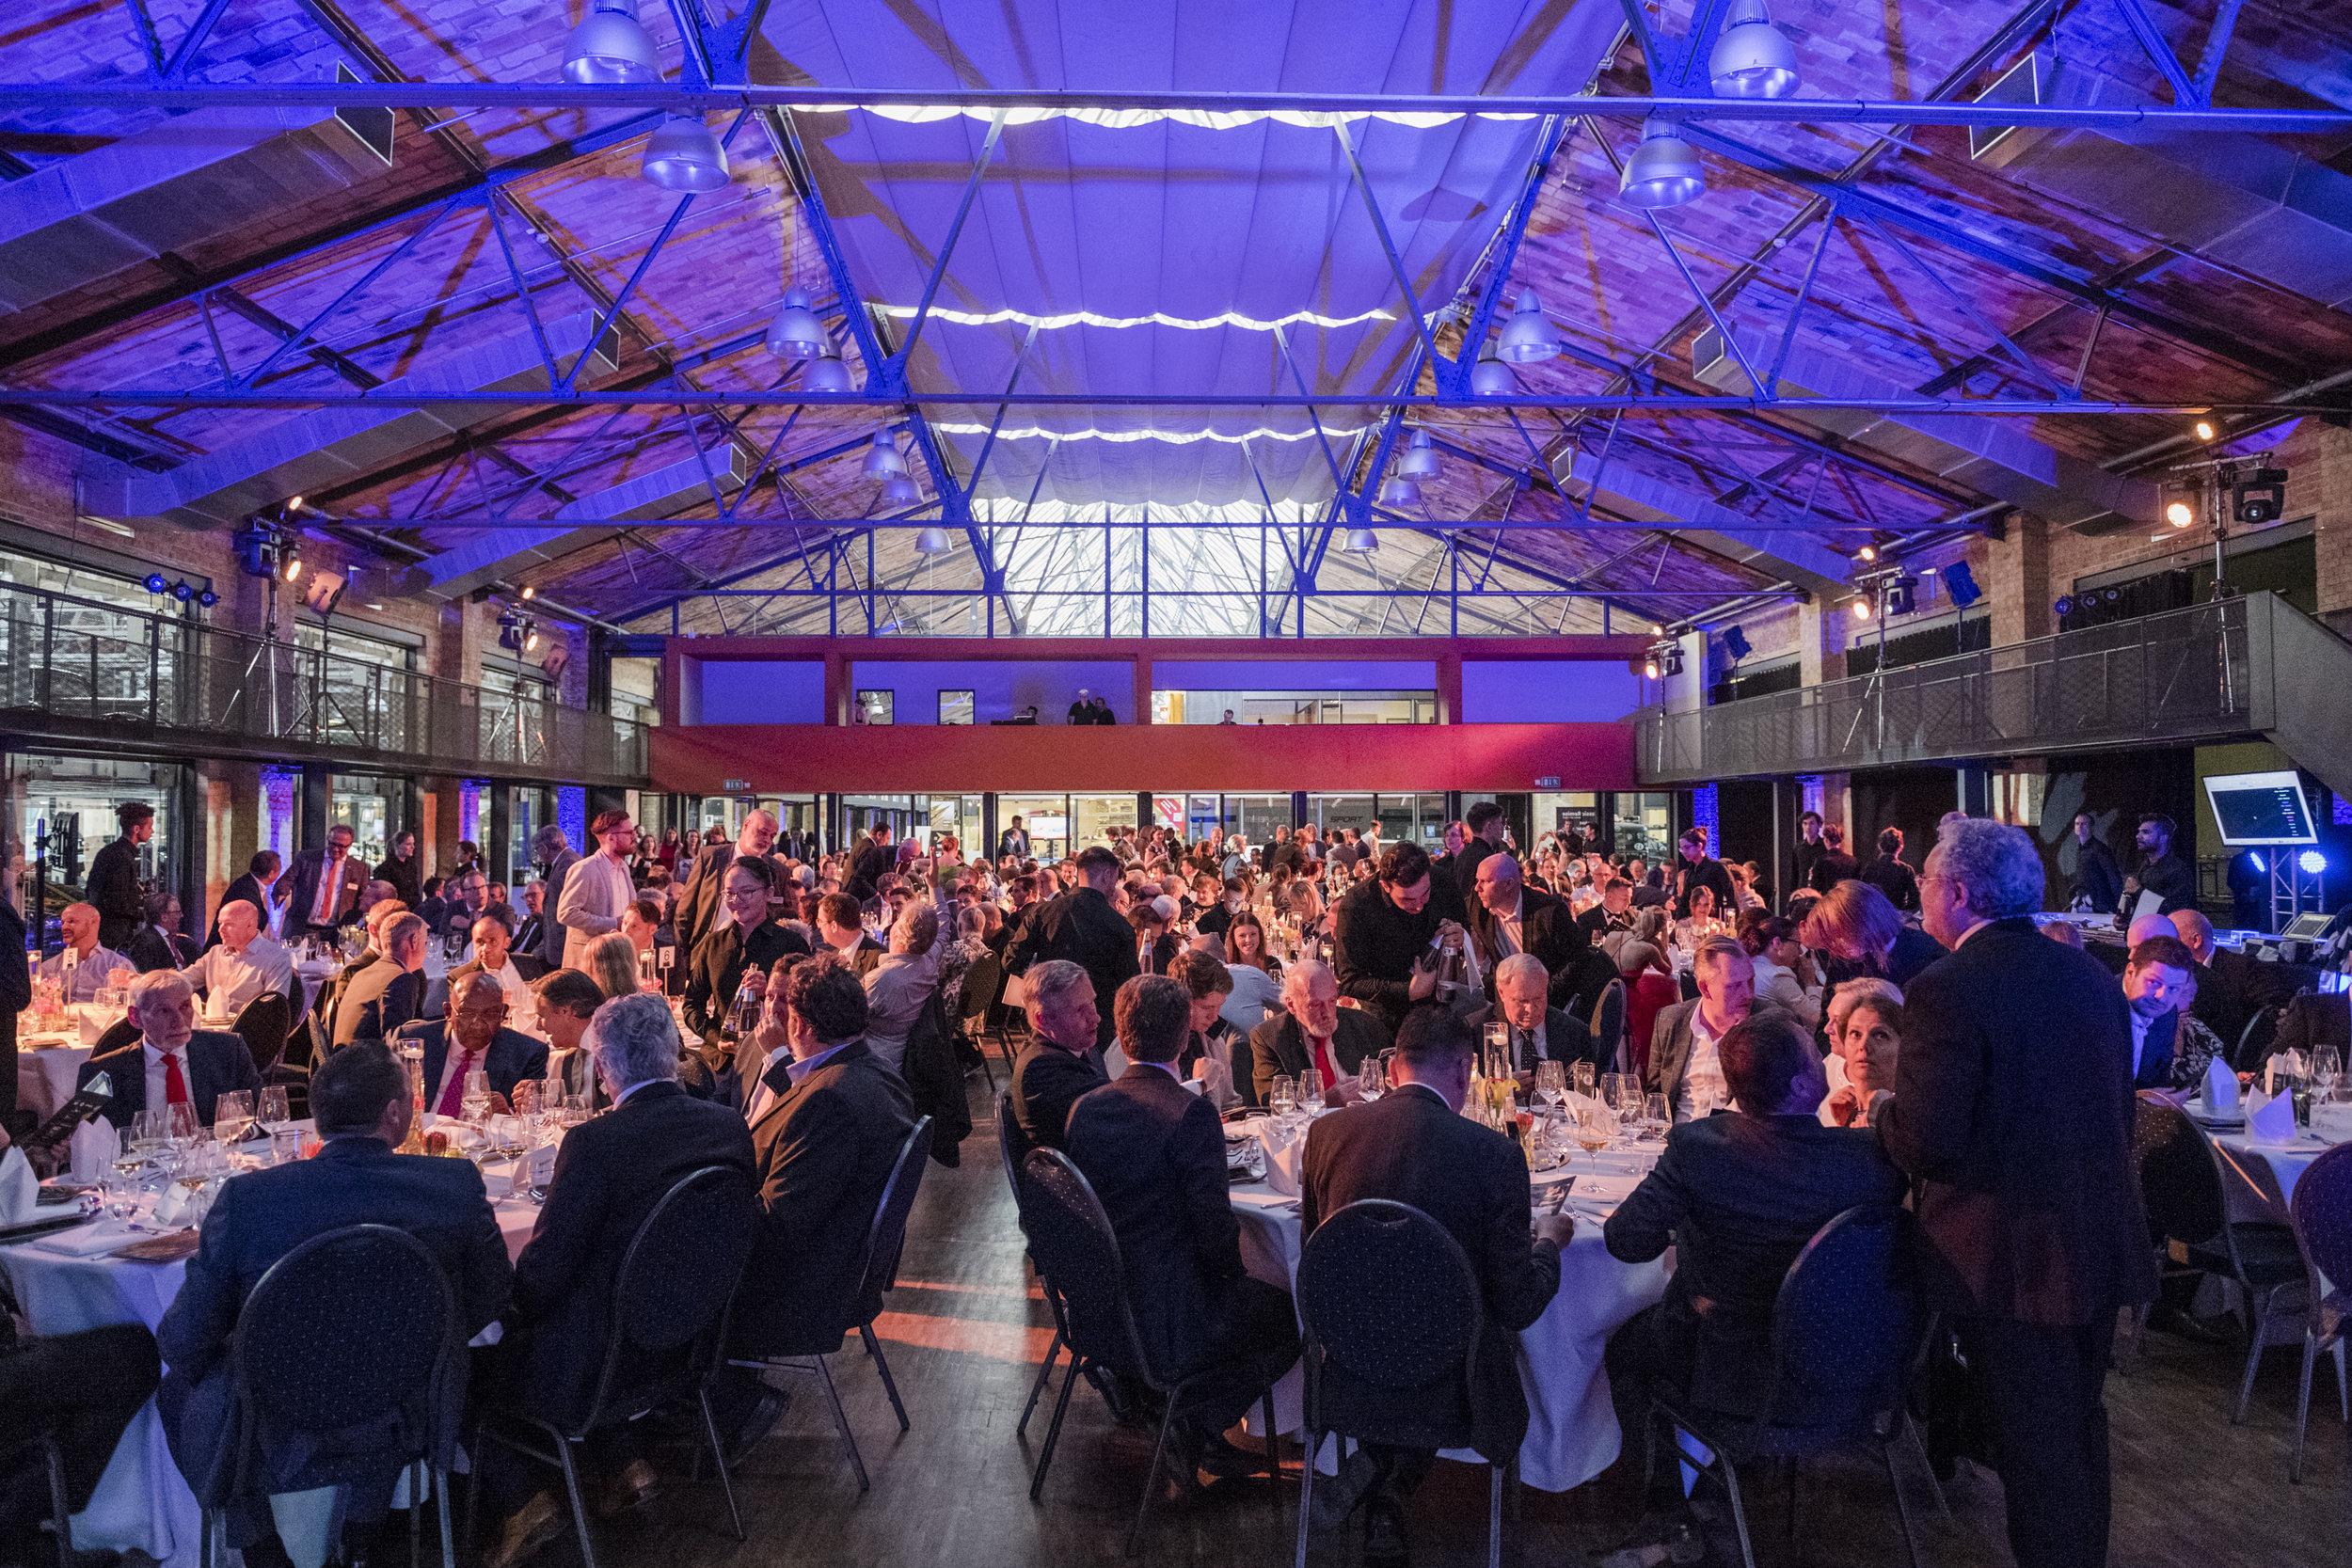 2018-05-16_FESPA_Awards_0072.jpg